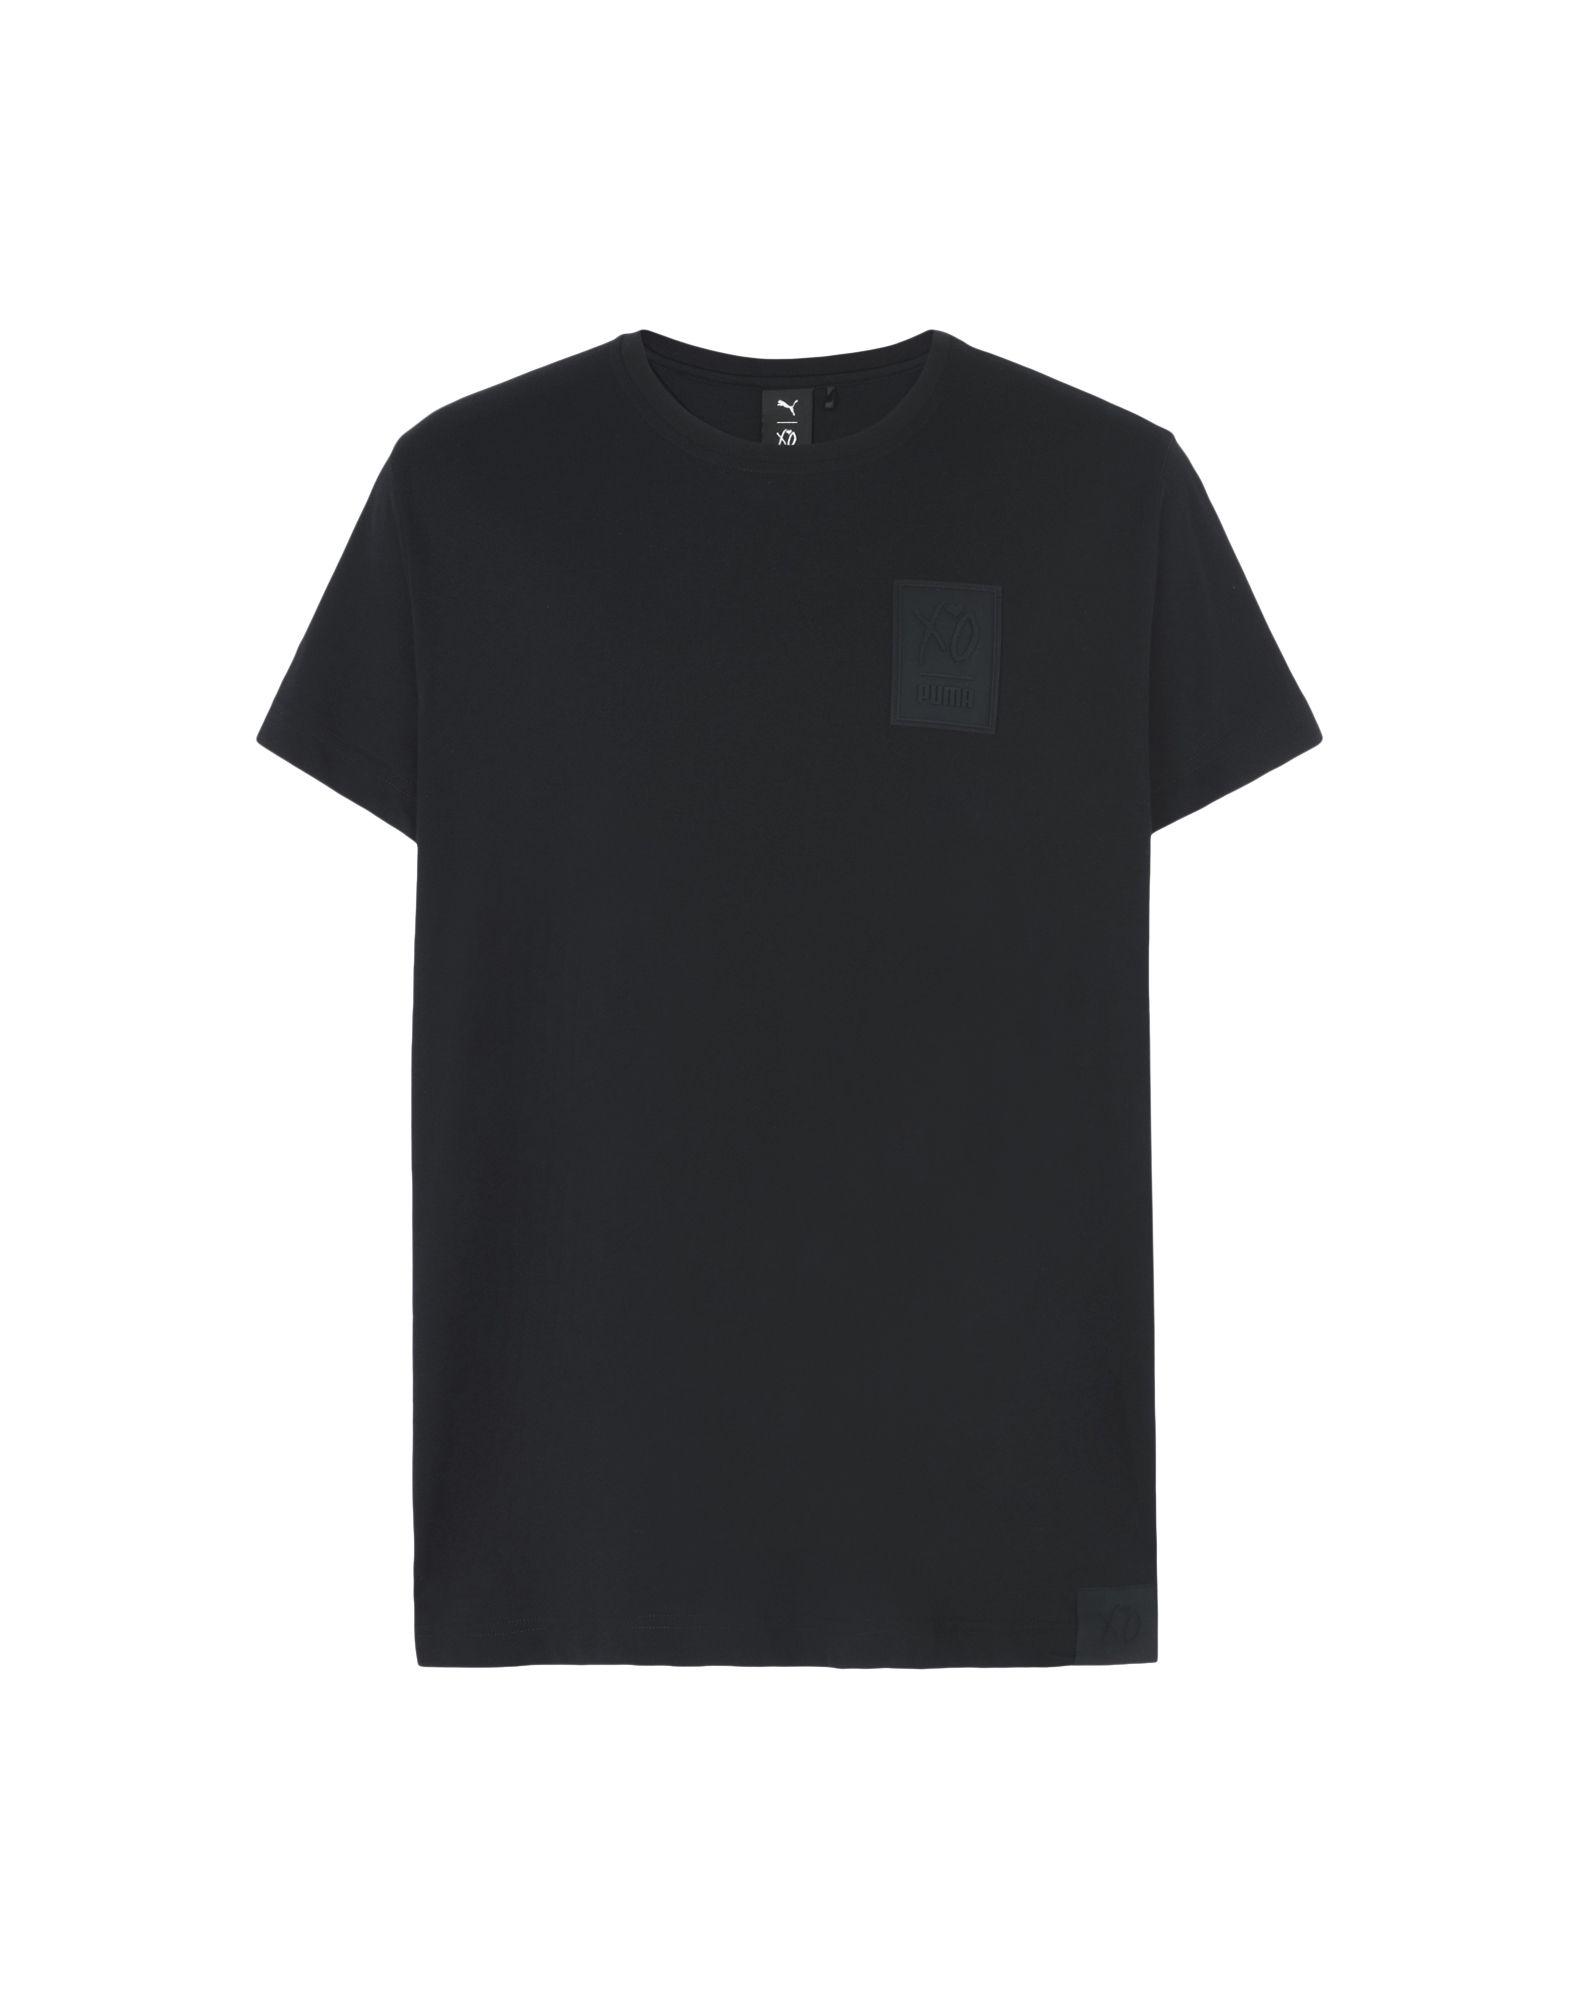 PUMA x XO Футболка puma футболка мужская puma big logo размер 50 52